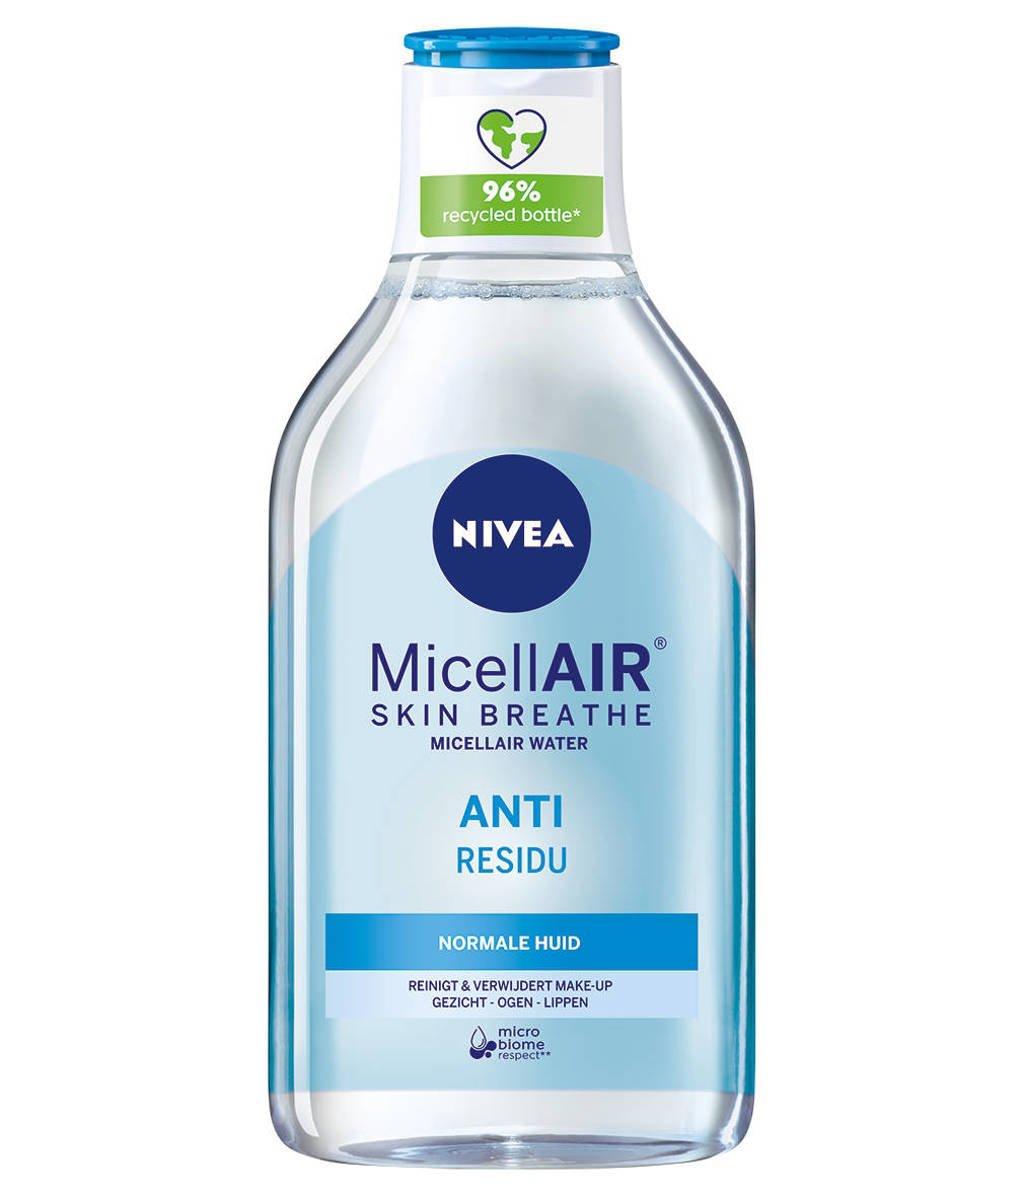 NIVEA micellair® skin breathe micellair water normale huid - 400 ml